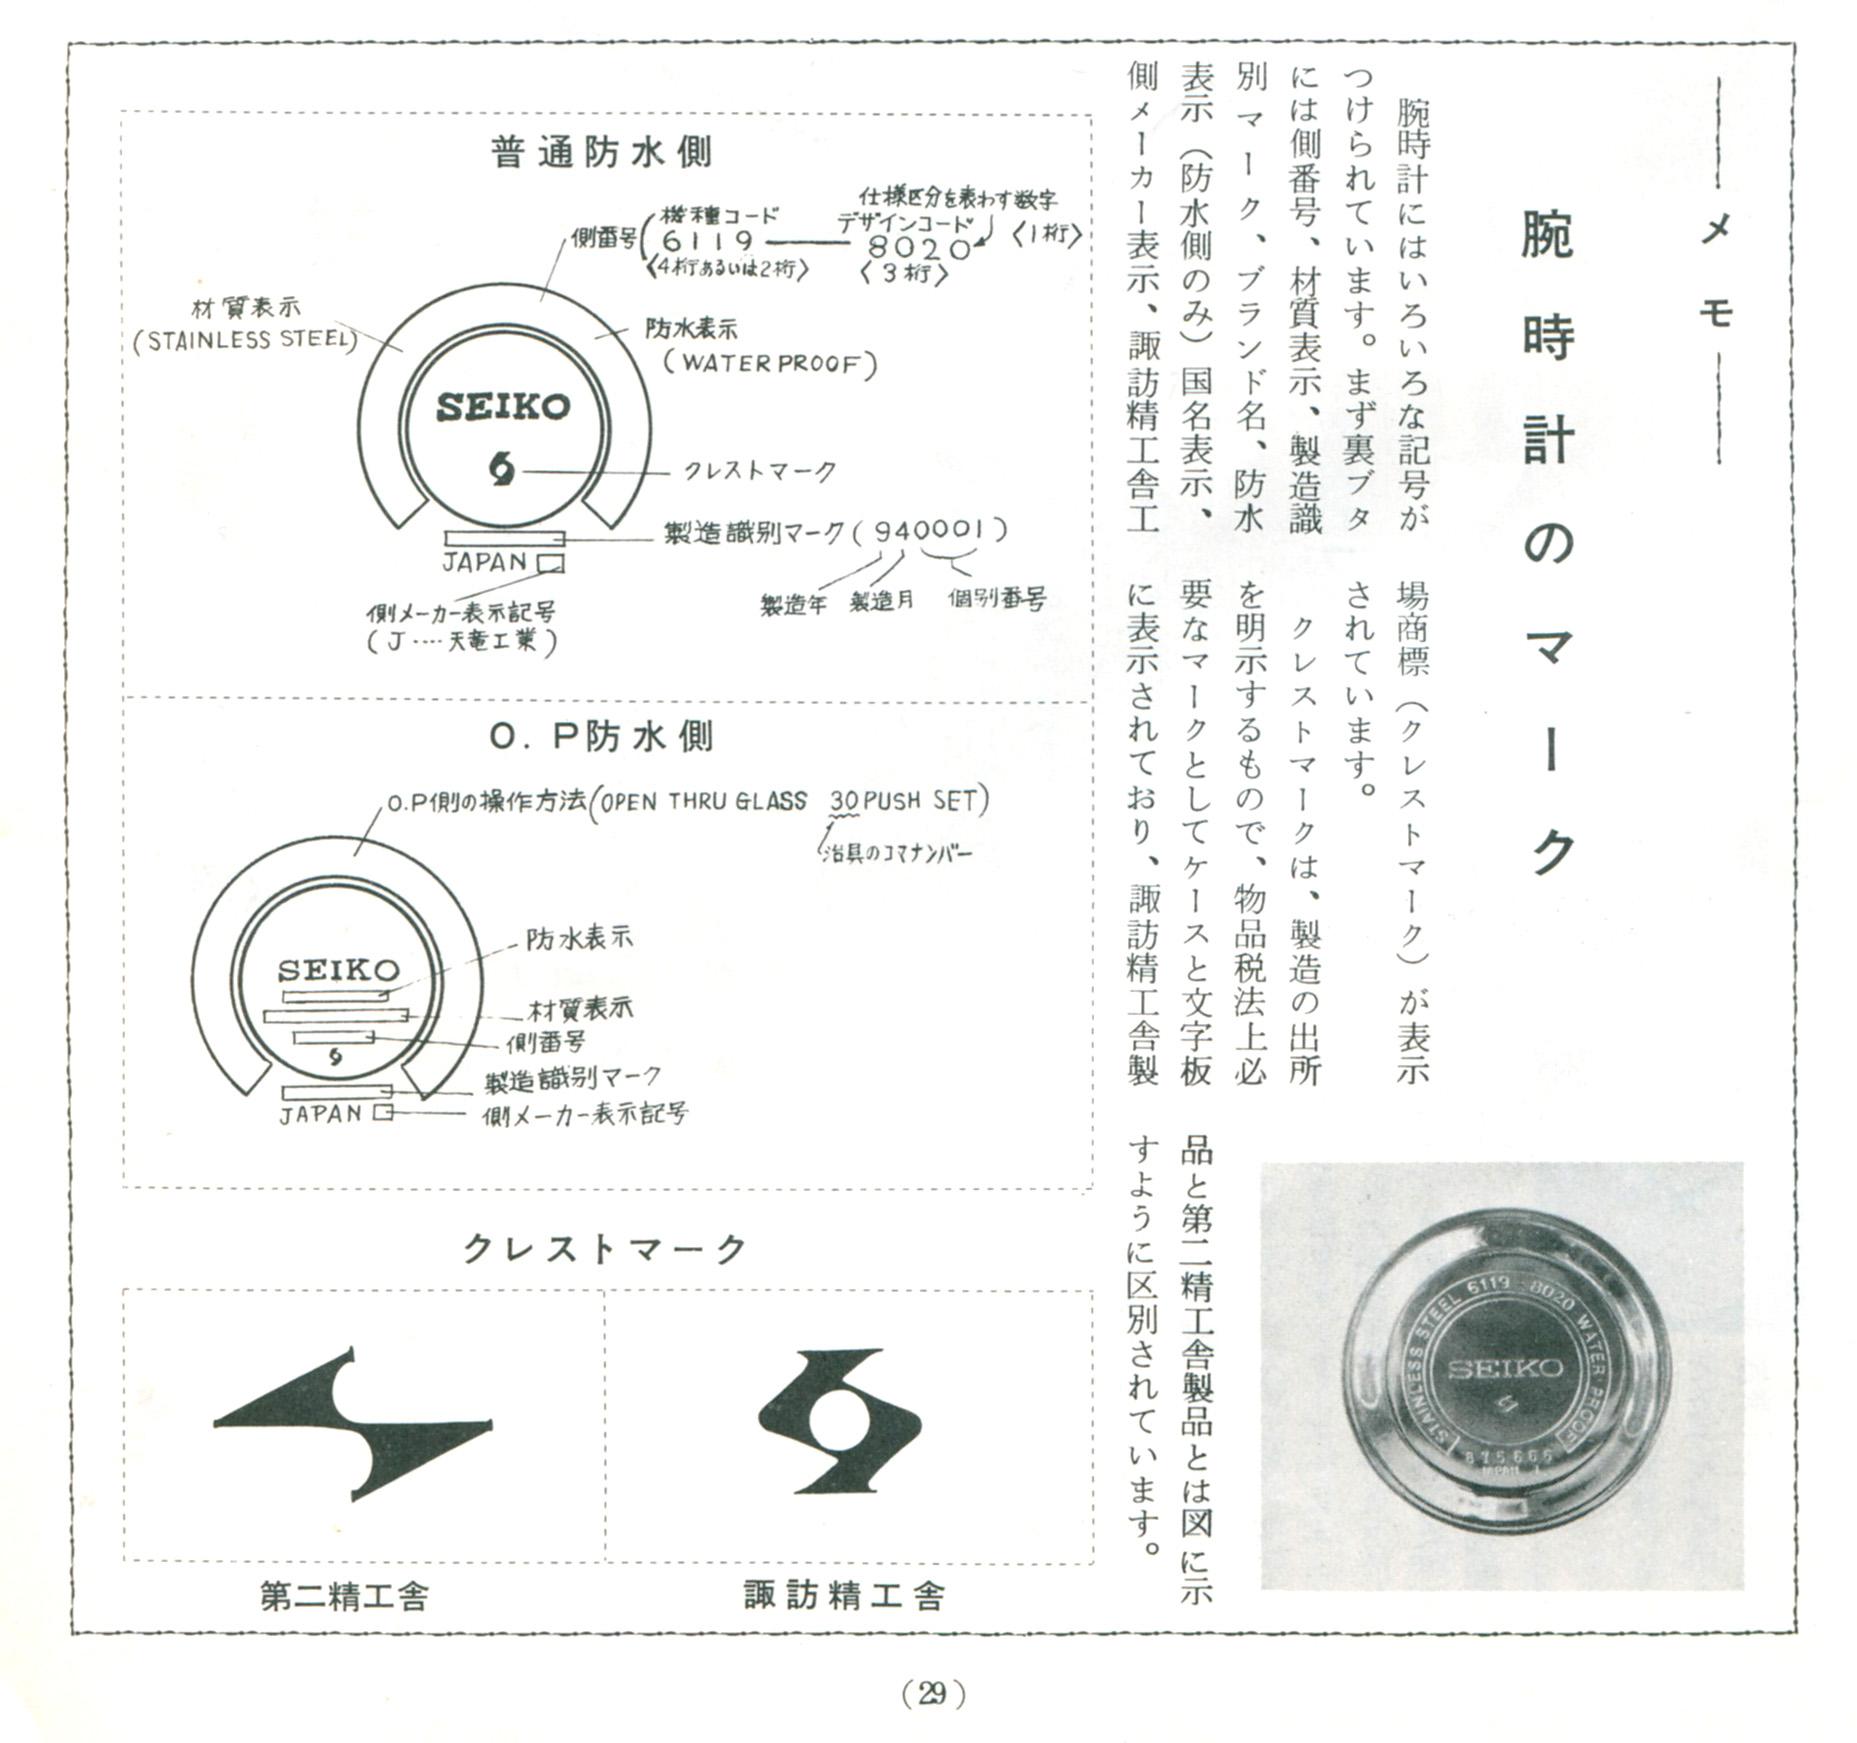 Original Japanese article